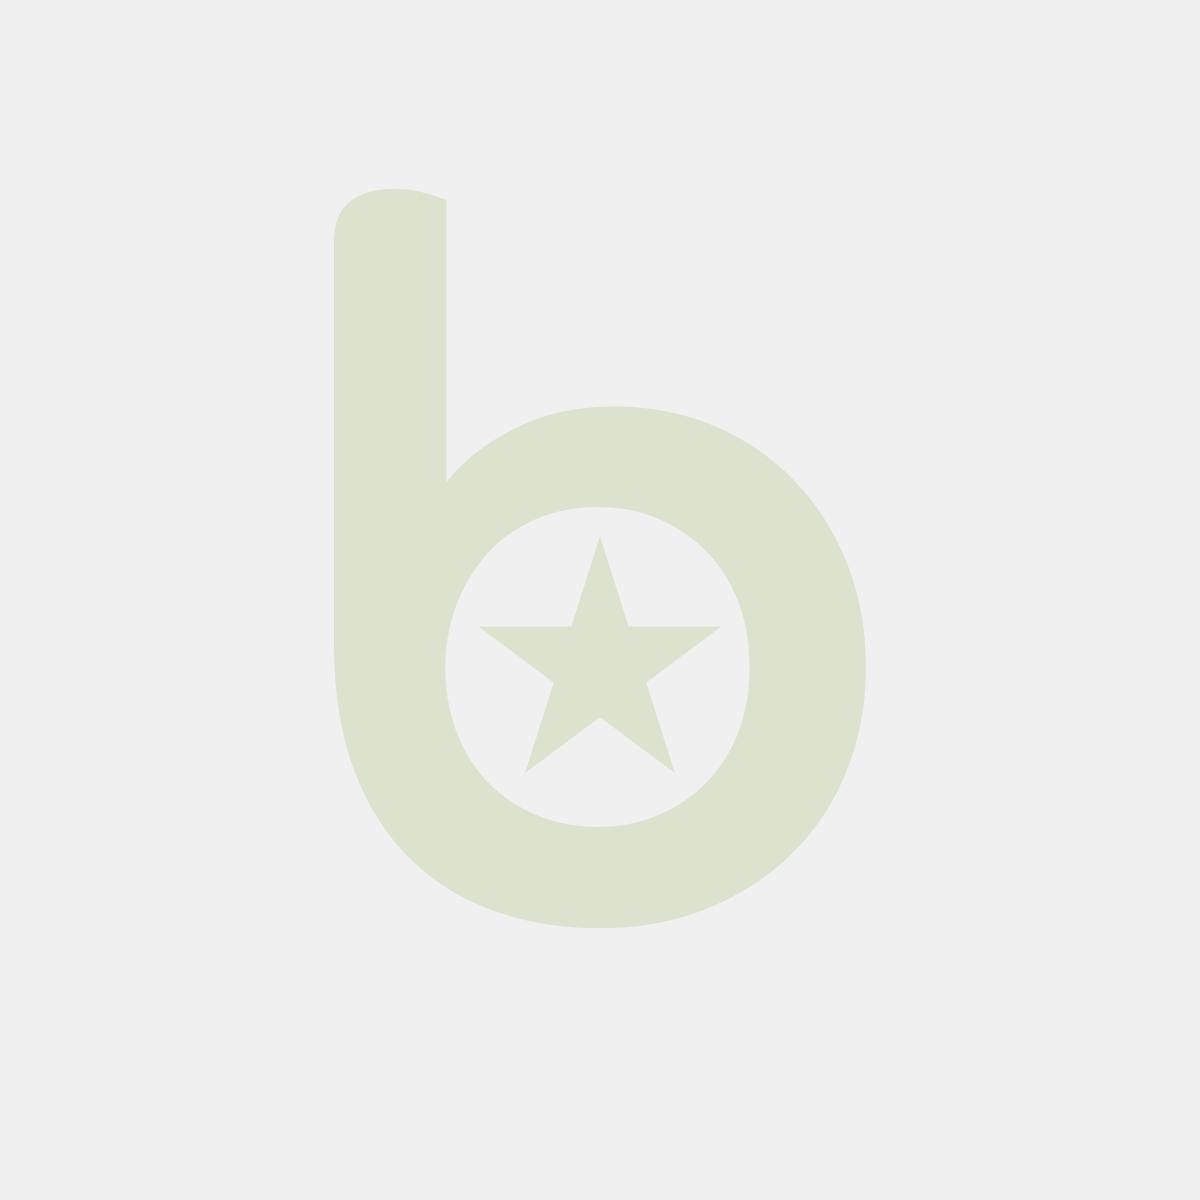 FINGERFOOD - patyczki 12cm PEARL op. 100 sztuk